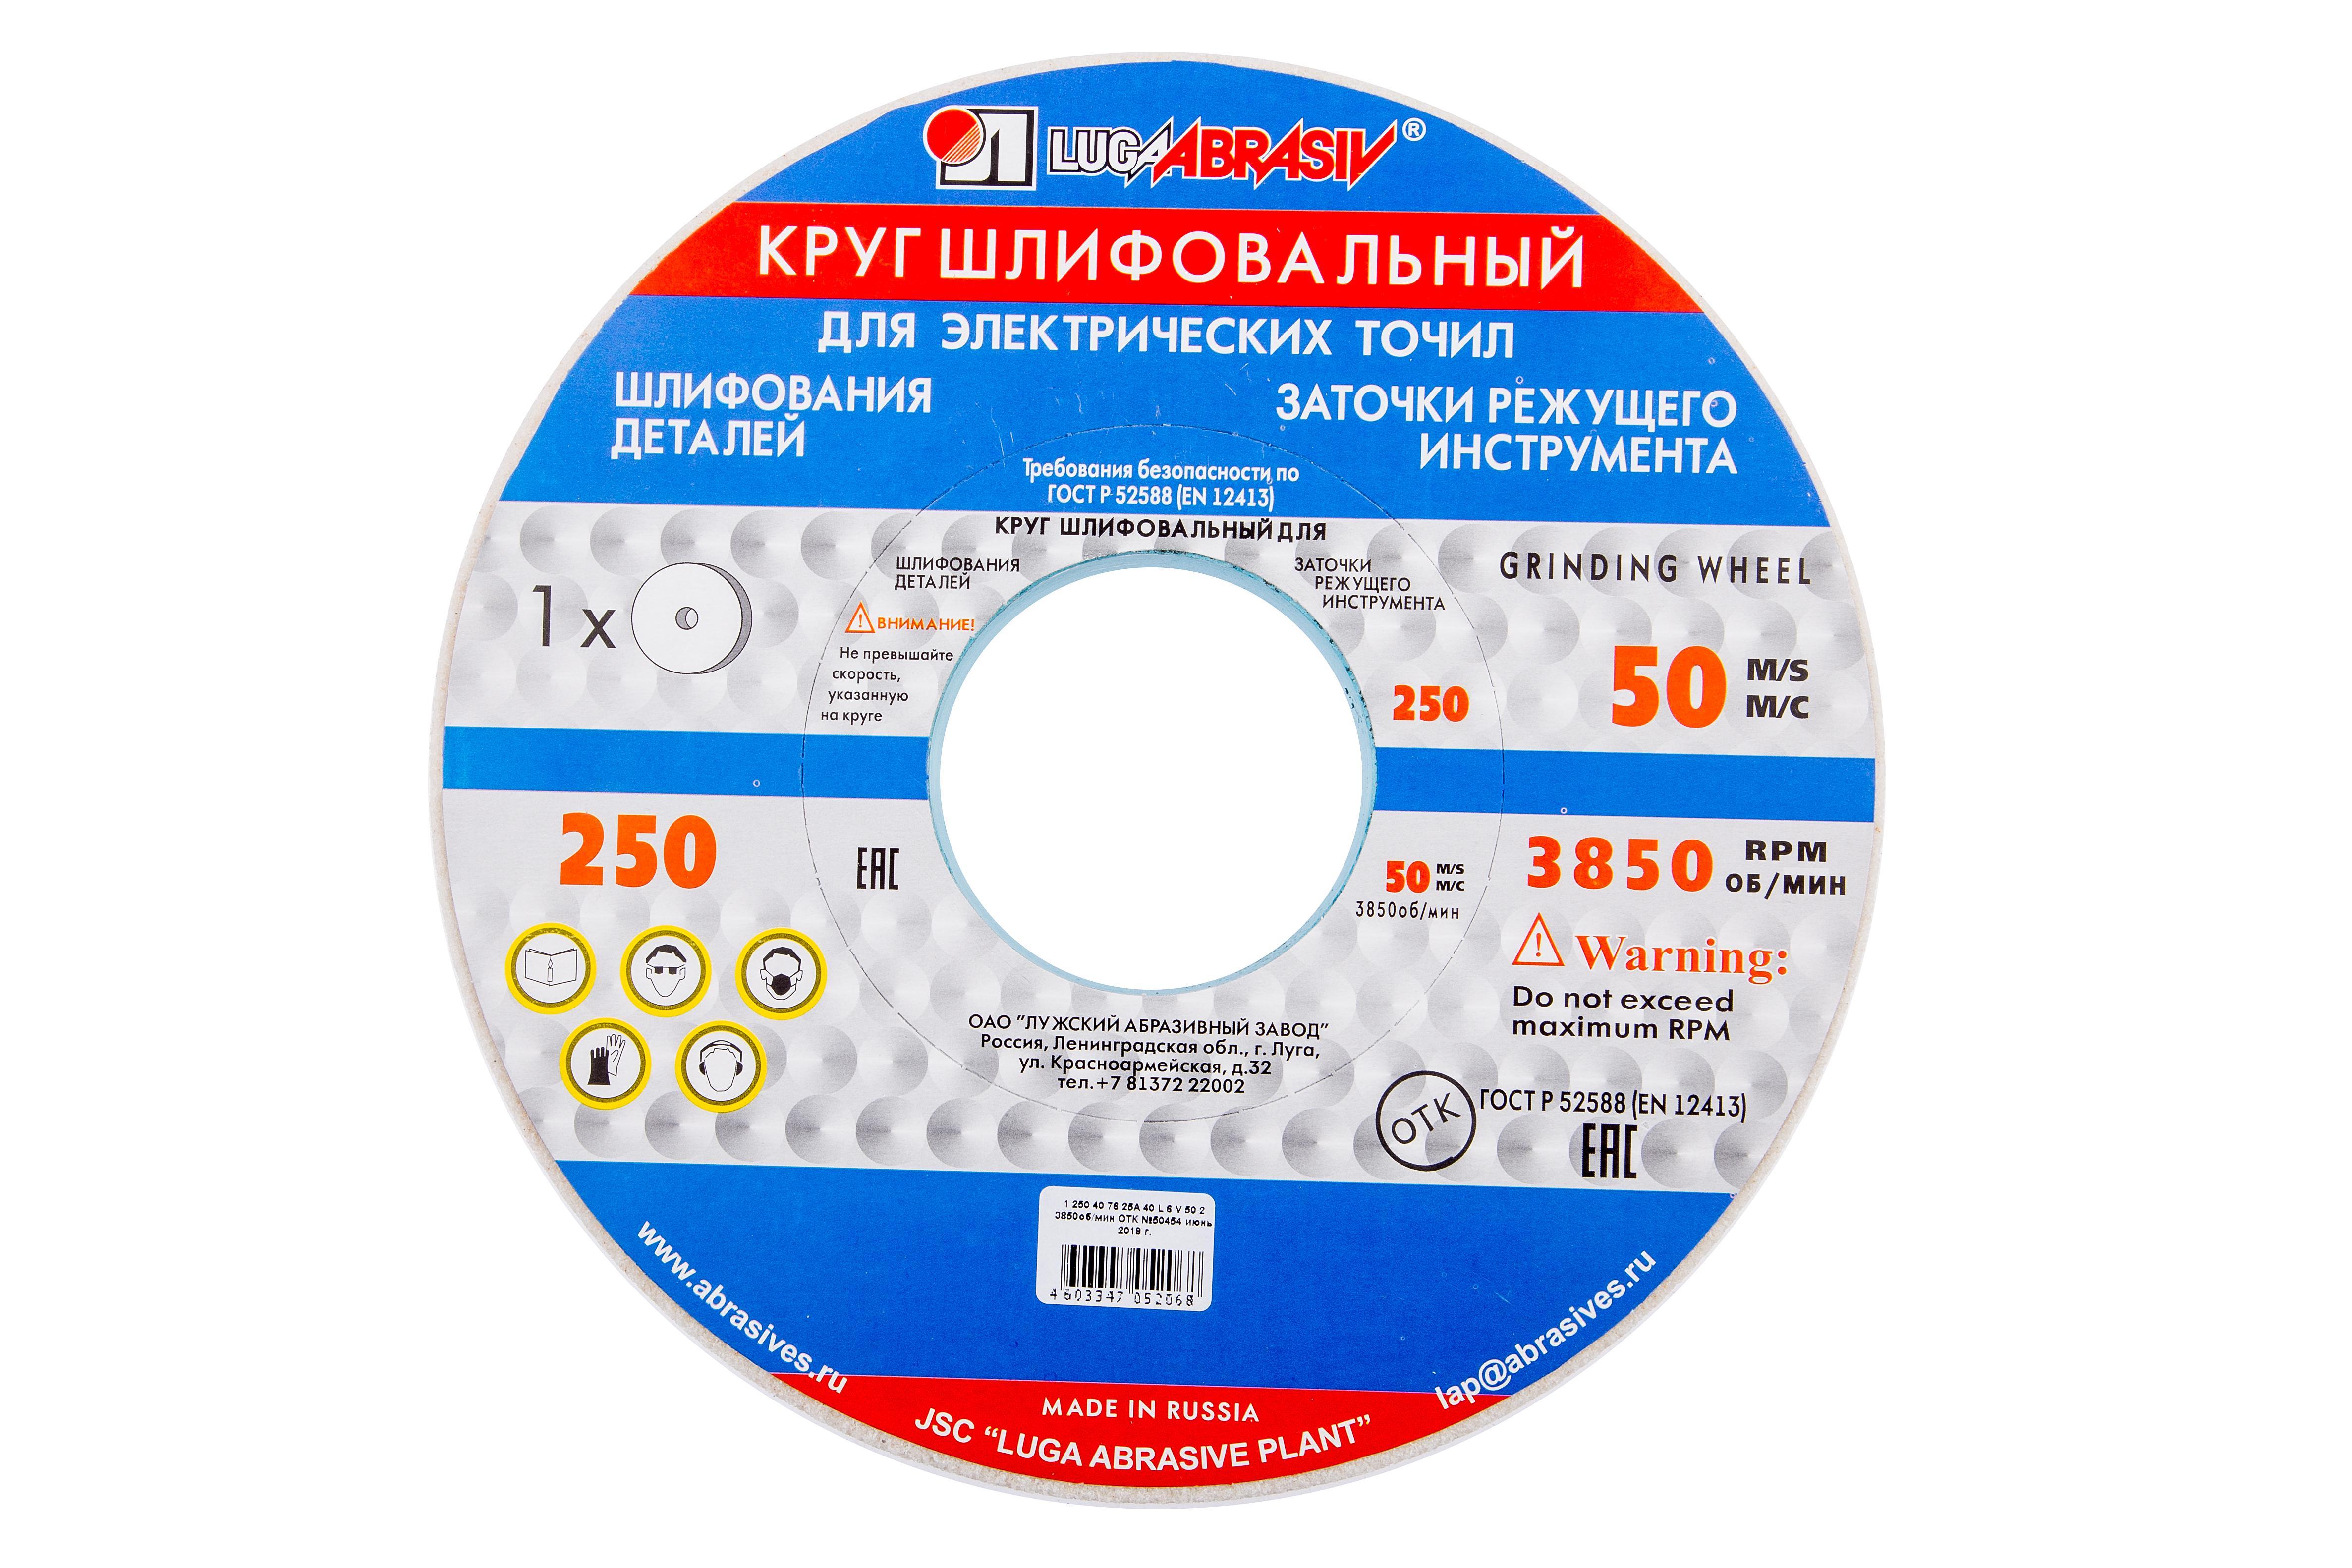 Круг шлифовальный ЛУГА-АБРАЗИВ 1 250 Х 40 Х 76 25А 40 k,l (40СМ) круг шлифовальный луга абразив 1 250 х 20 х 32 25а 40 k l